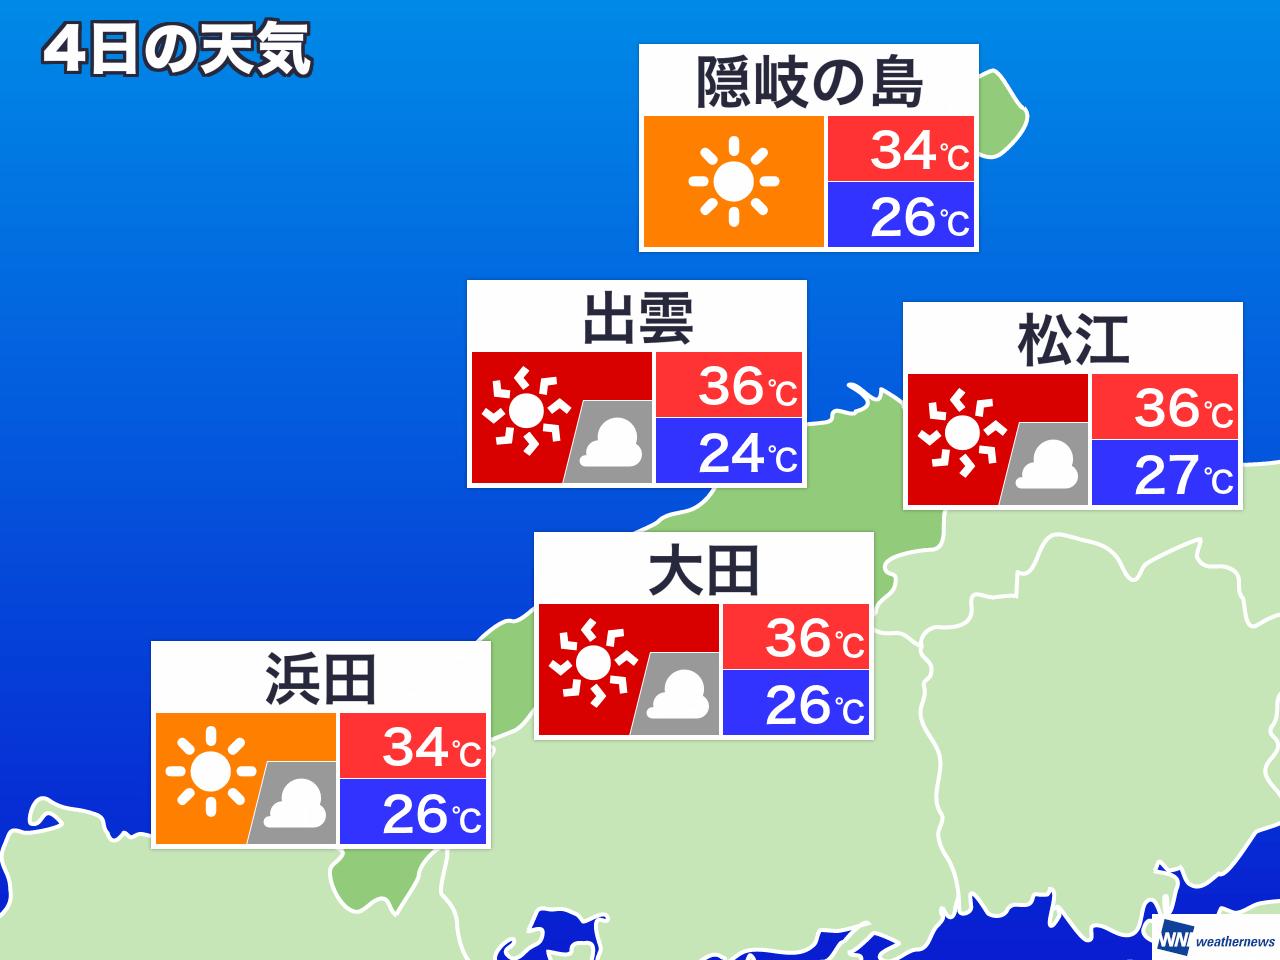 天気 松江 の 明日